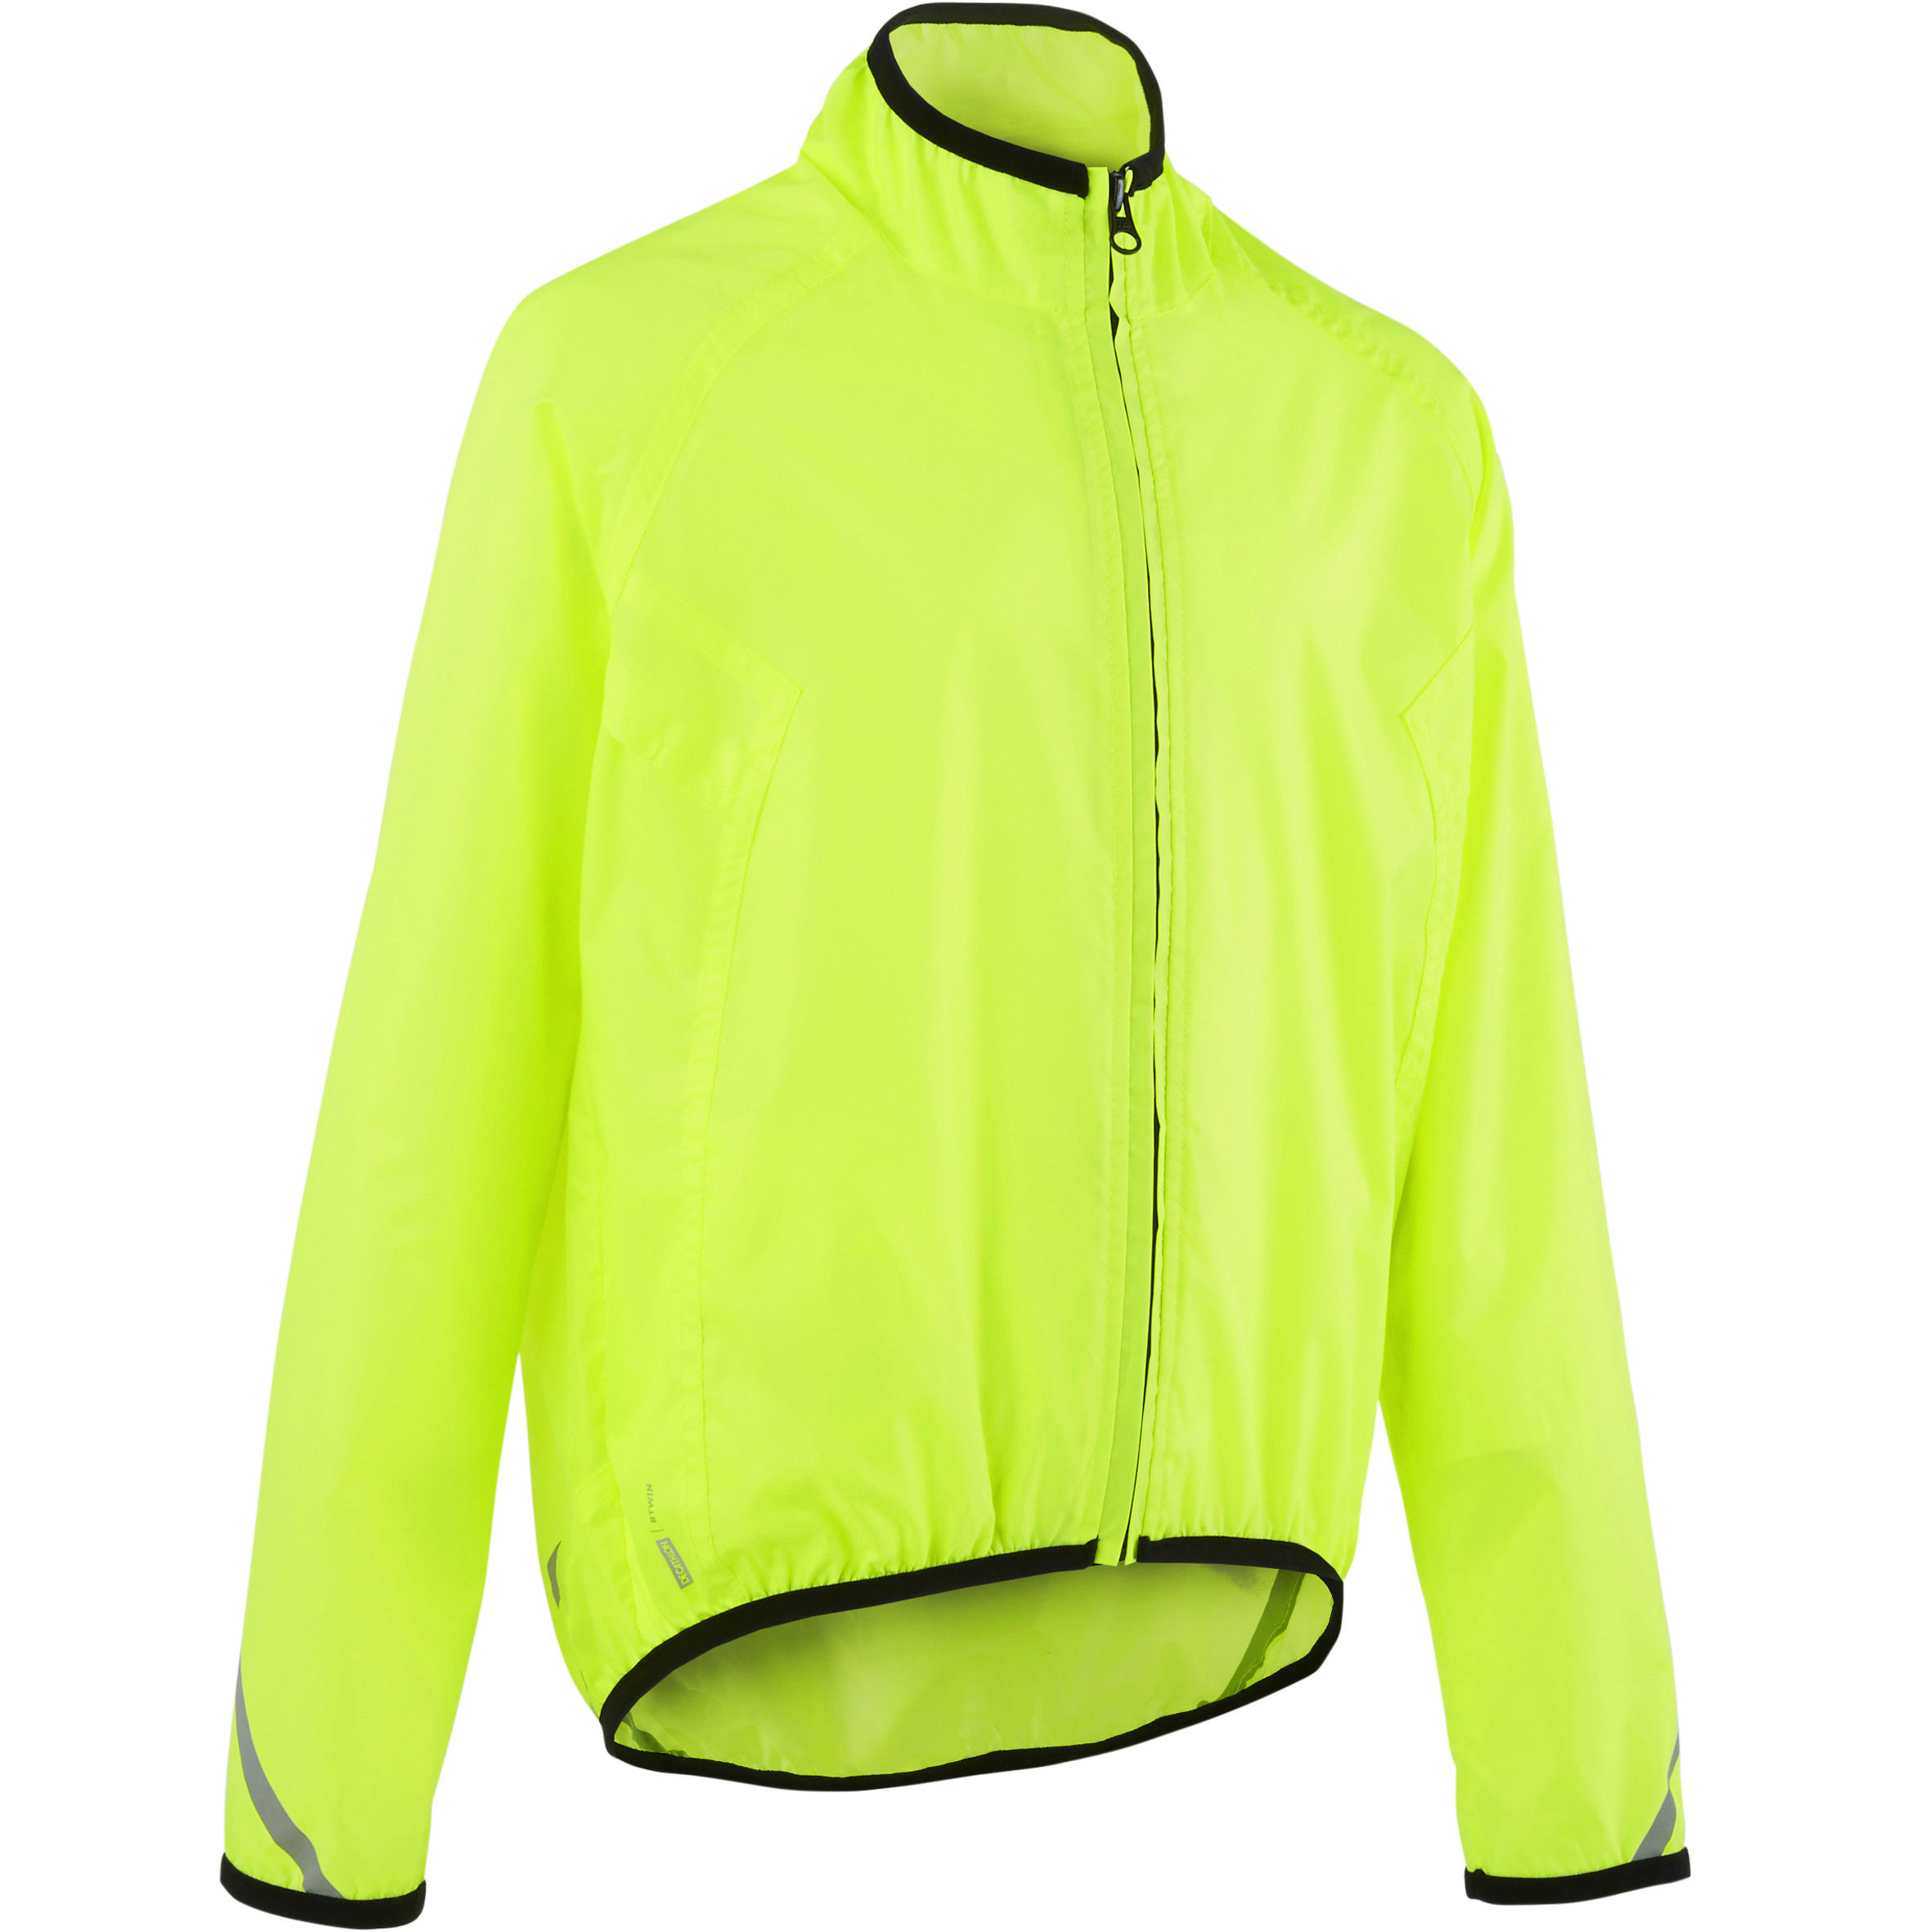 Jachetă Ploaie 300 Copii